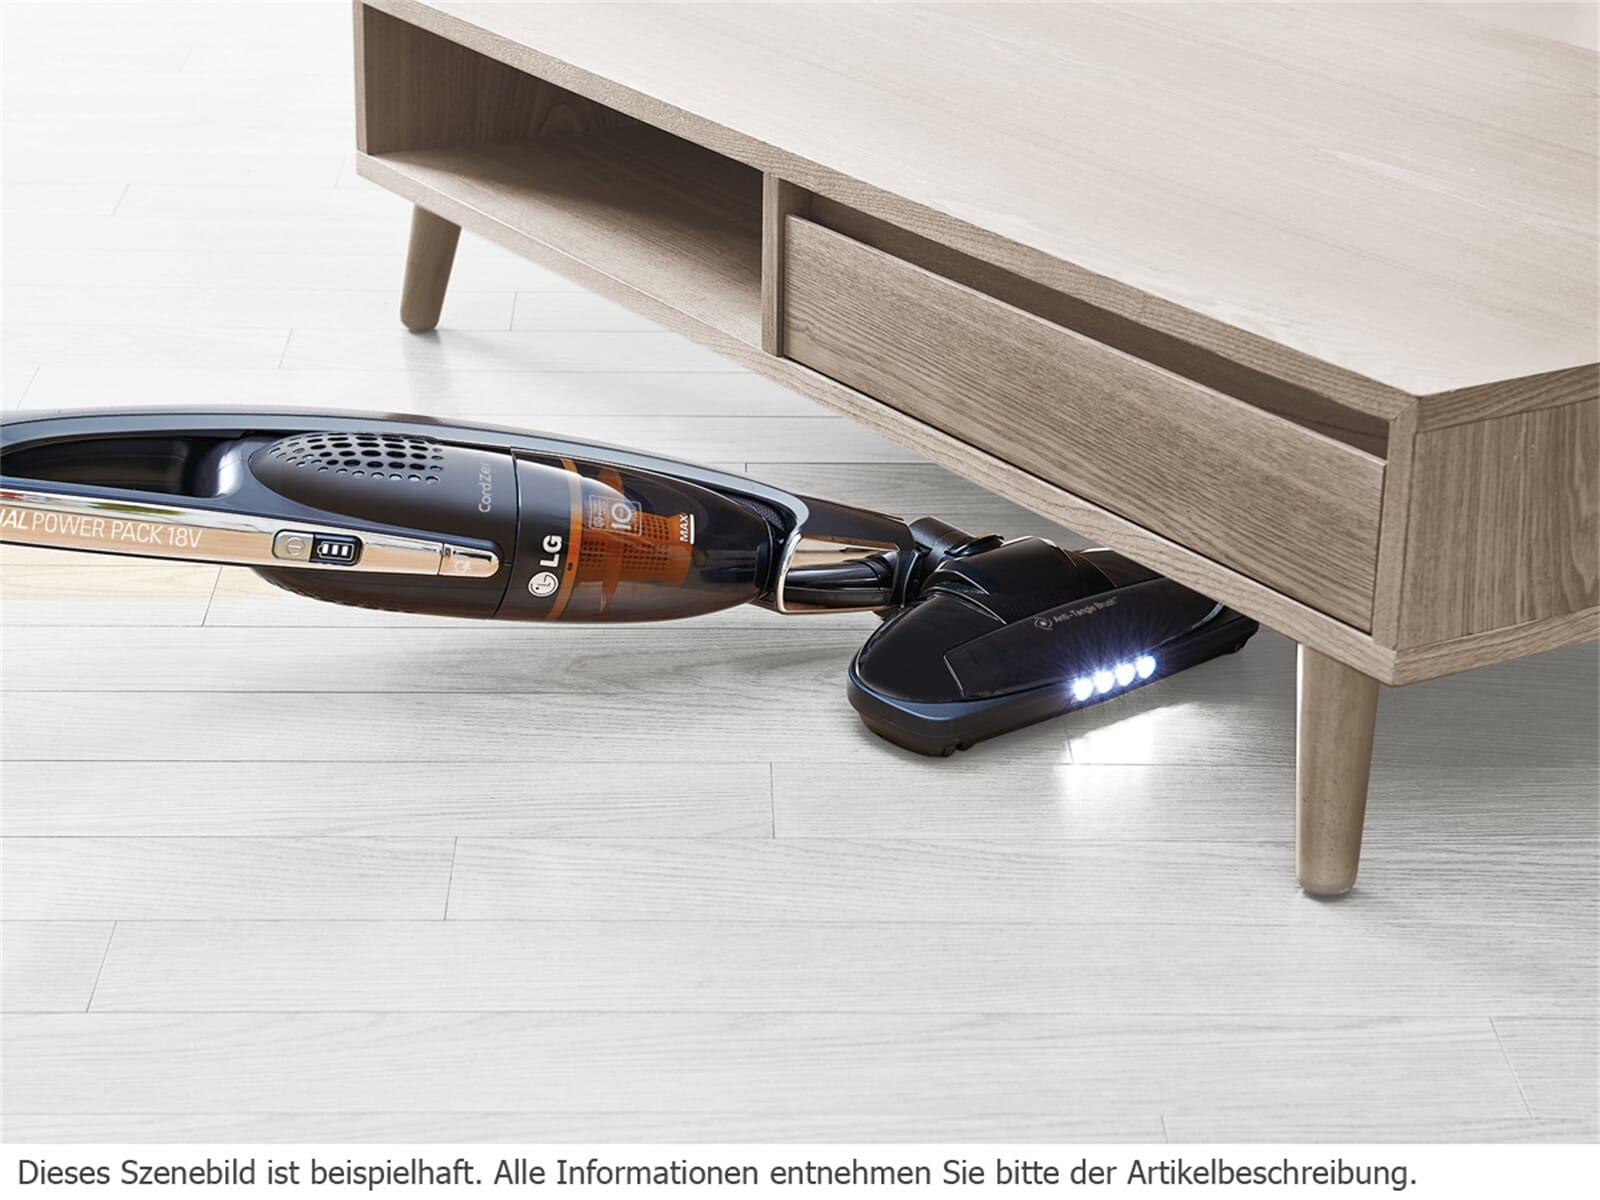 LG VS 8404 SCW Kabelloser Handstaubsauger Schwarz / Lime Green